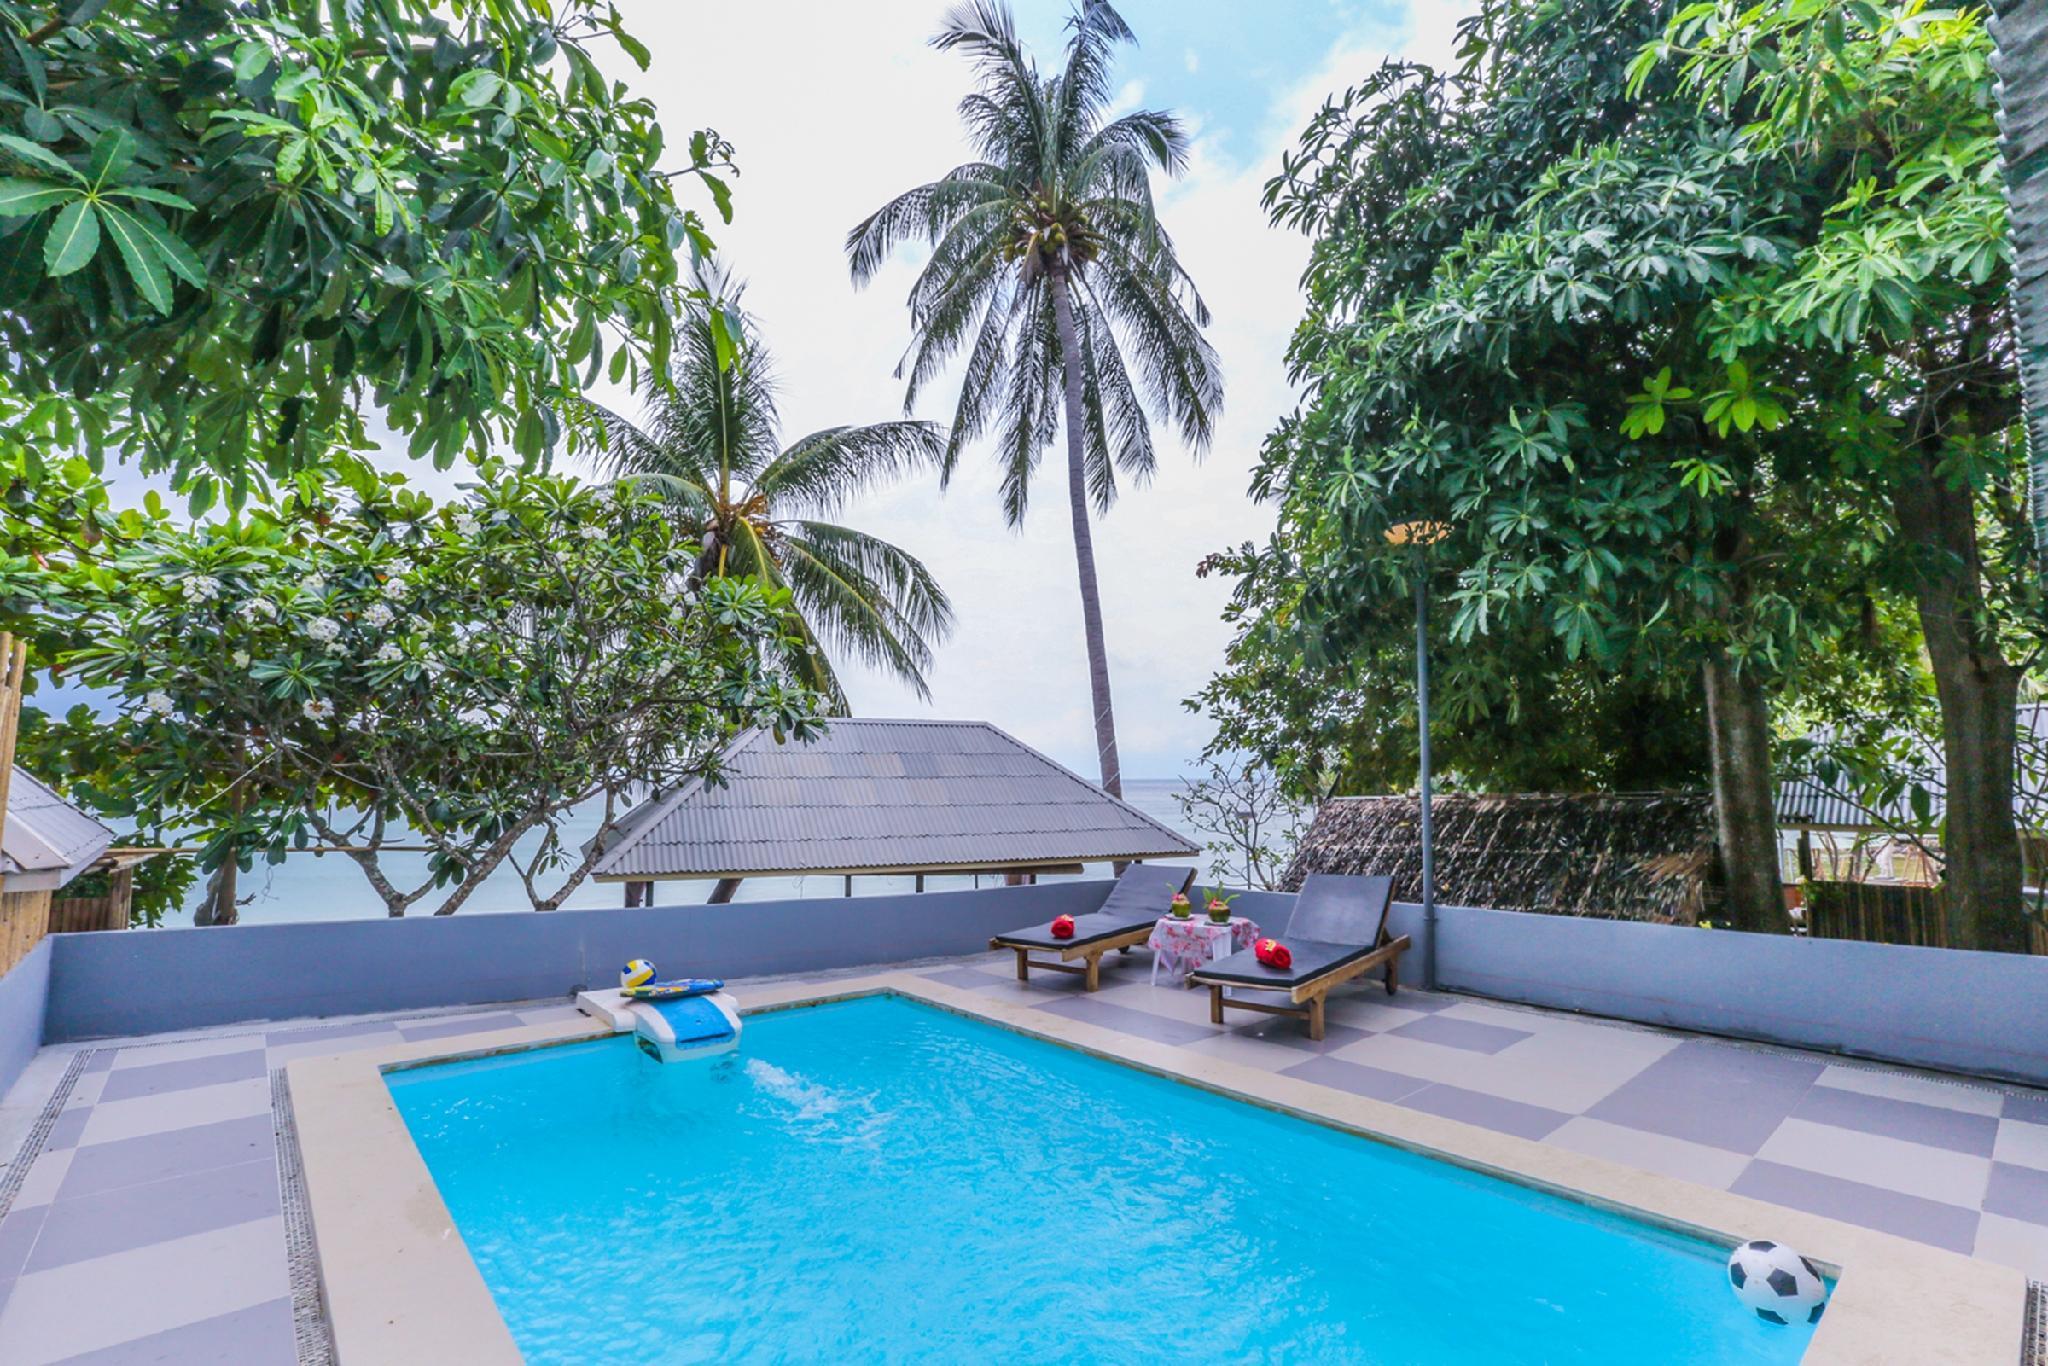 Villa Cha Cha Salad Beach Koh Phangan in Thailand - Room